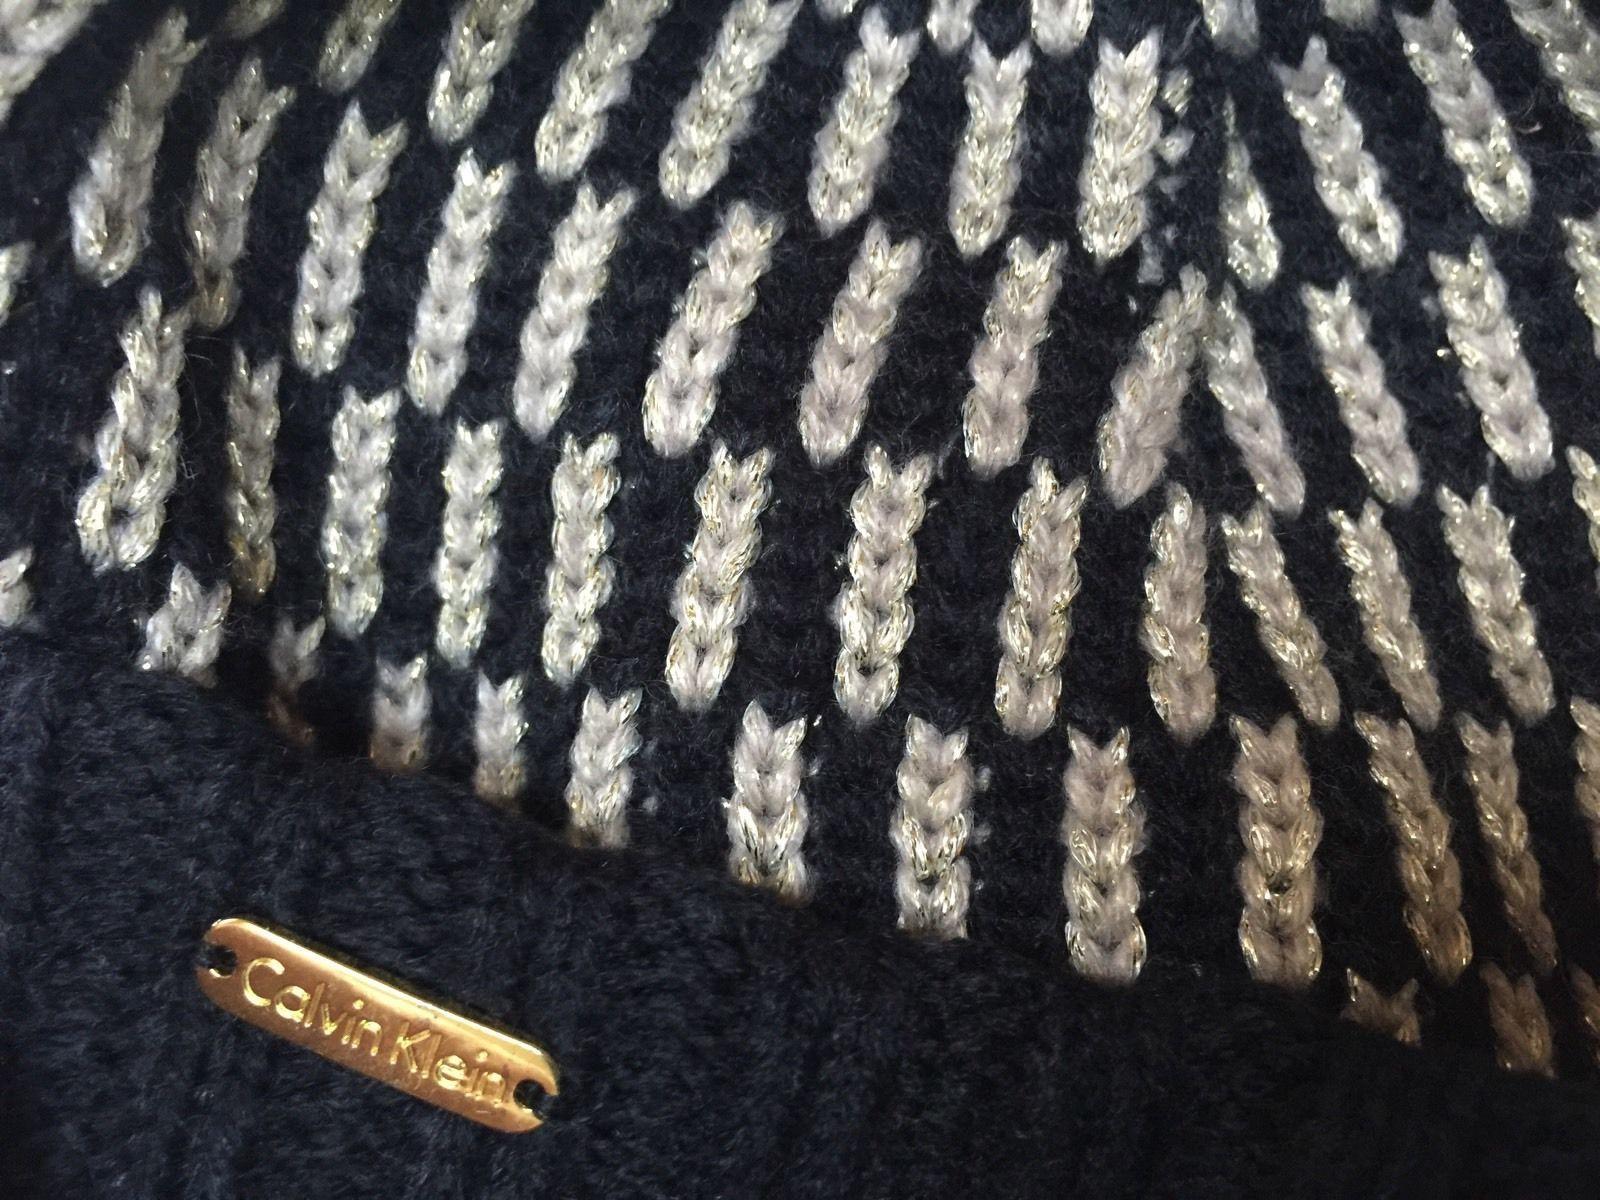 8673b603fe9 CALVIN KLEIN SPARKLE GOLD   Black Geometric Knit Womens Winter Hat BEANIE  Cap